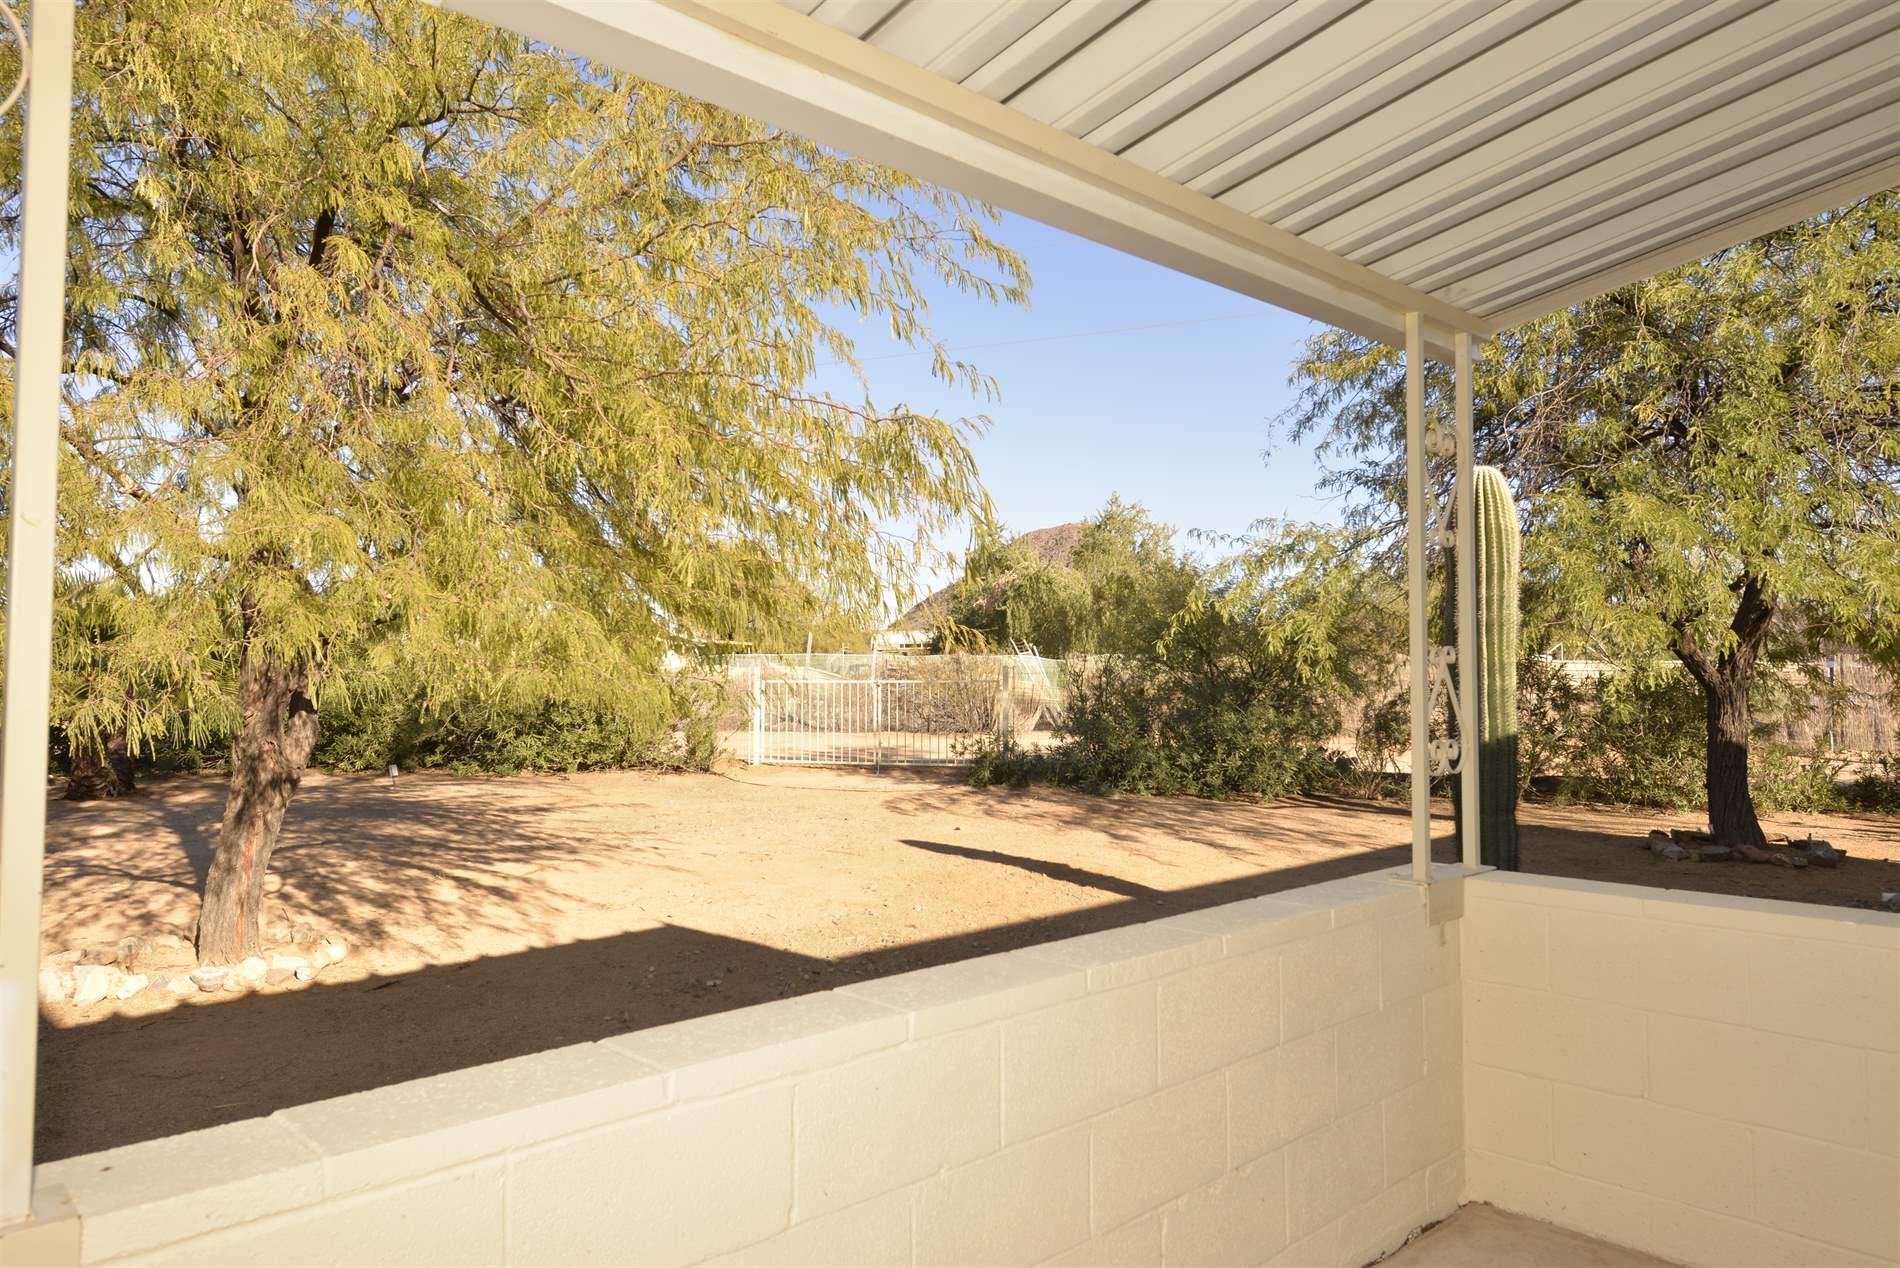 7891 N Team Roper Rd, Tucson, AZ 85743